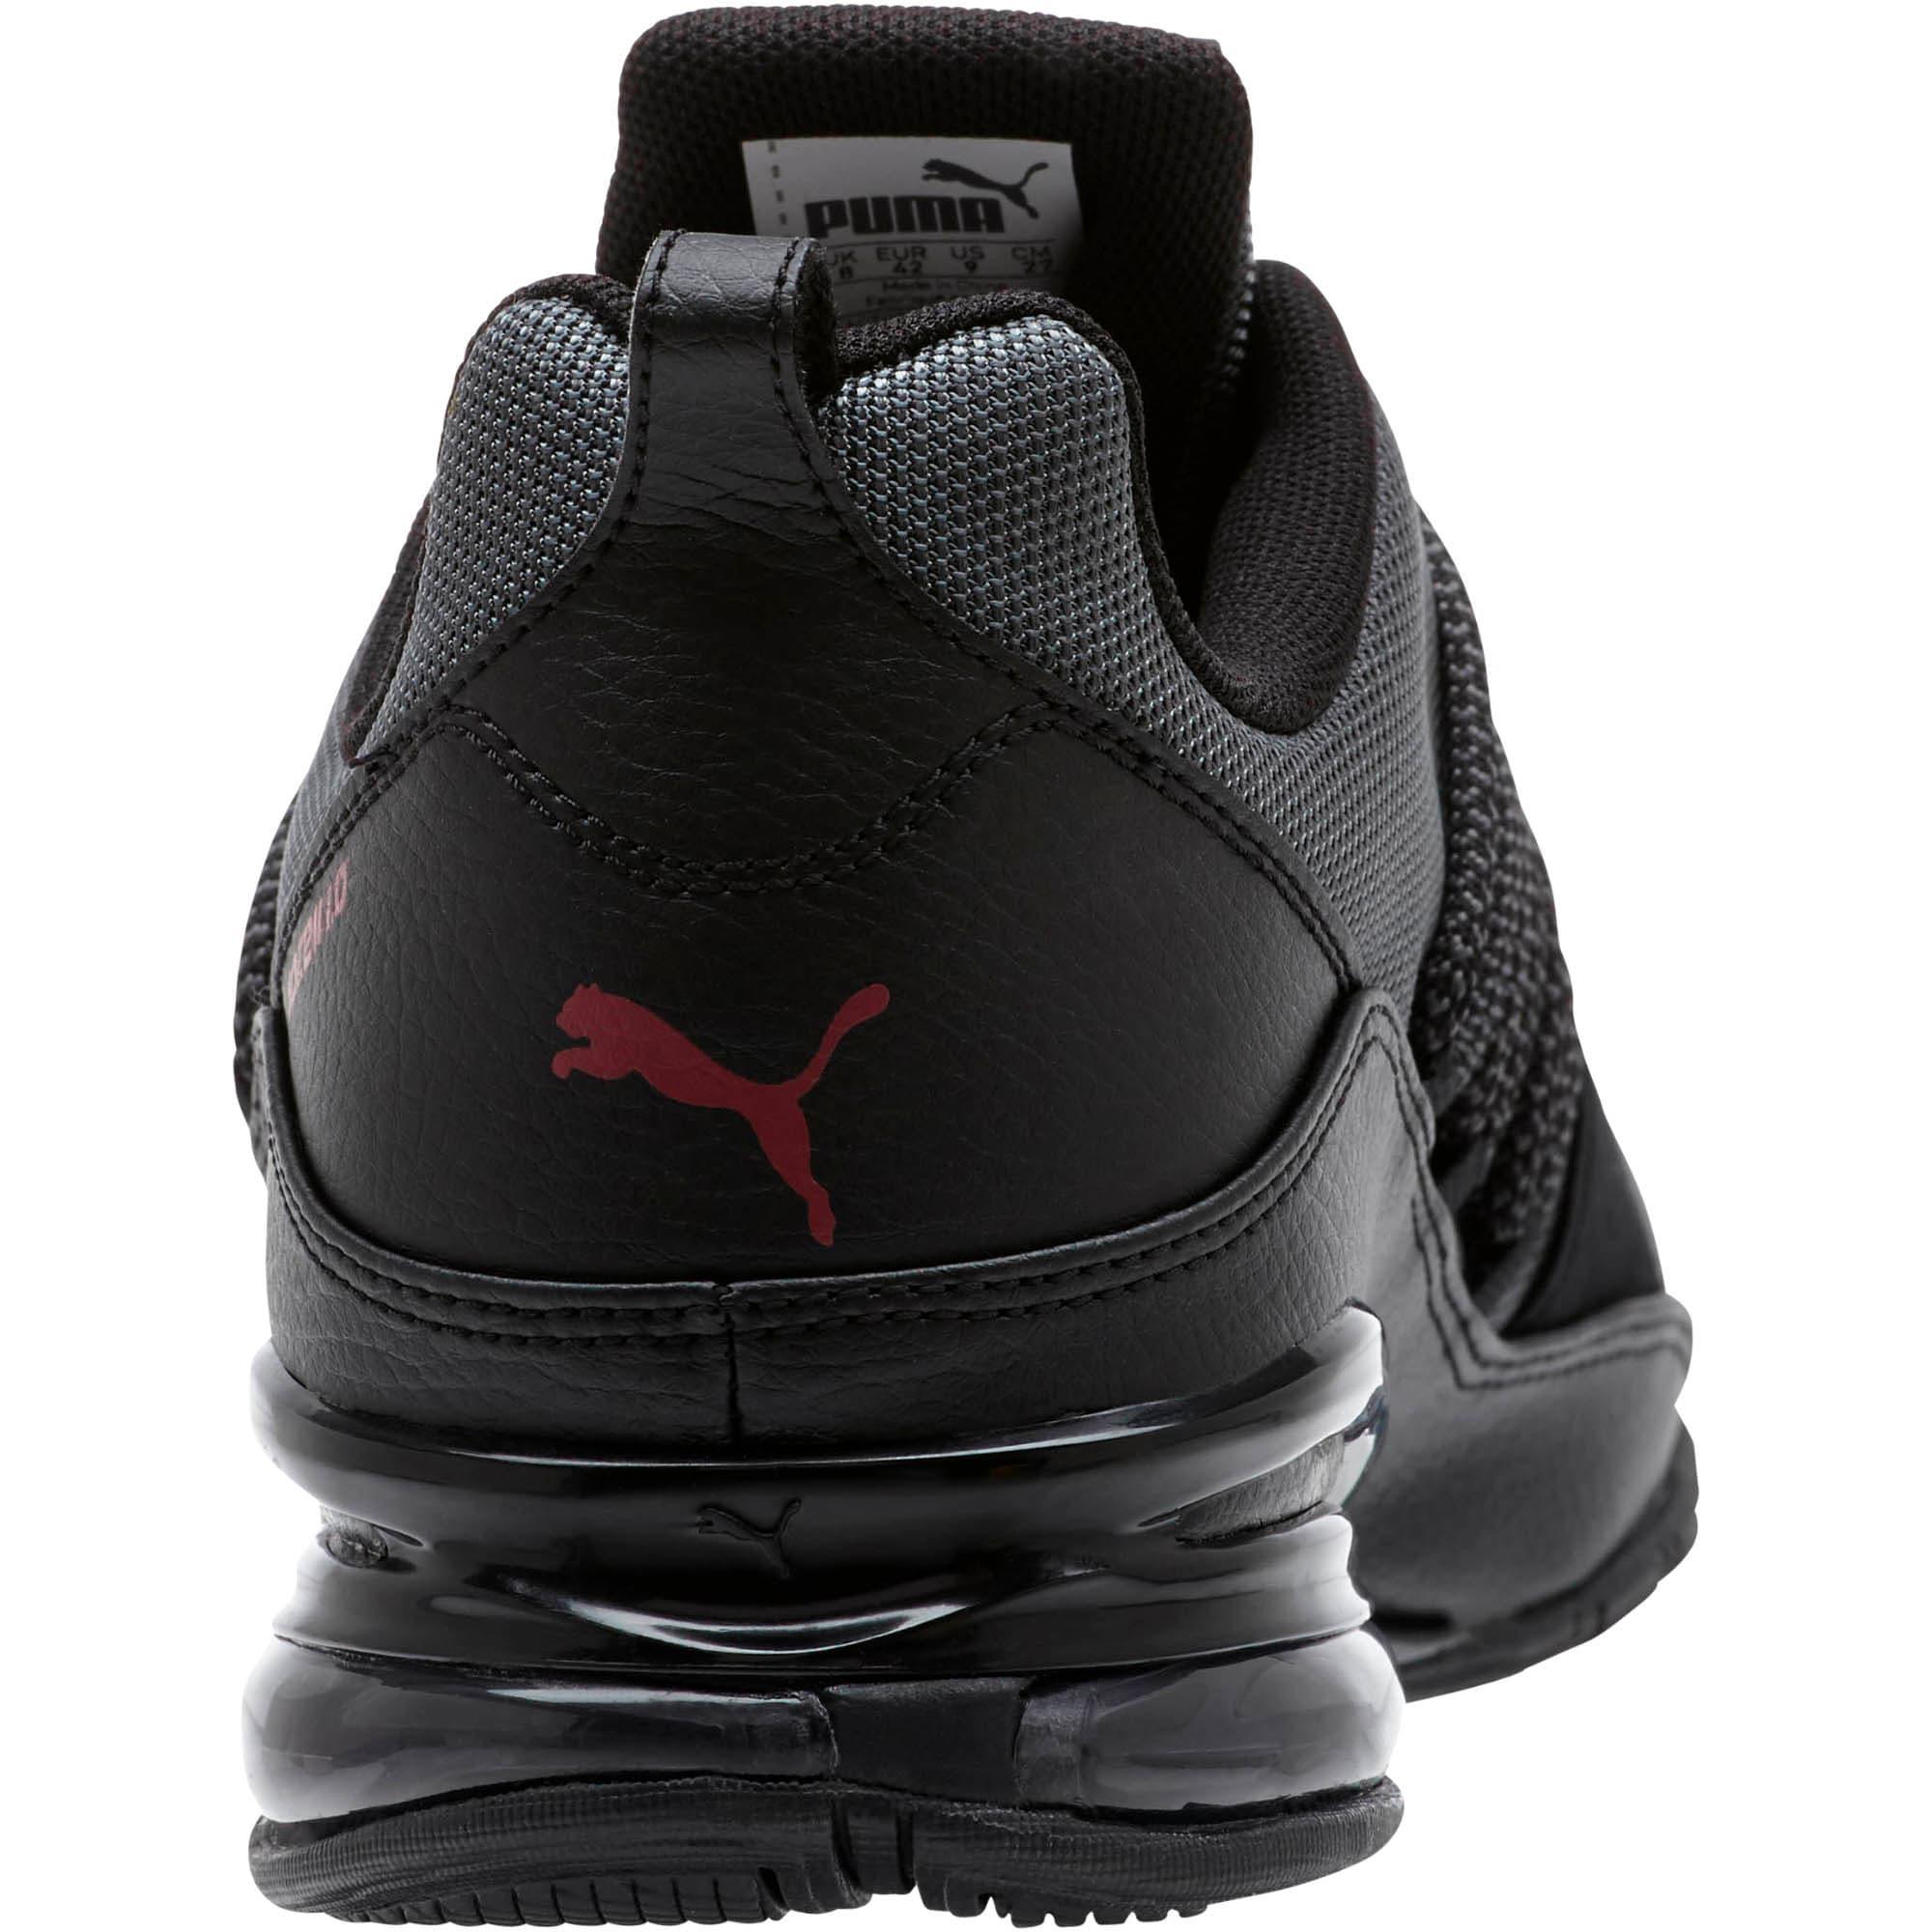 Thumbnail 4 of Cell Regulate KRM Men's Running Shoes, IronGate-PumaBlack-Pomegrnt, medium